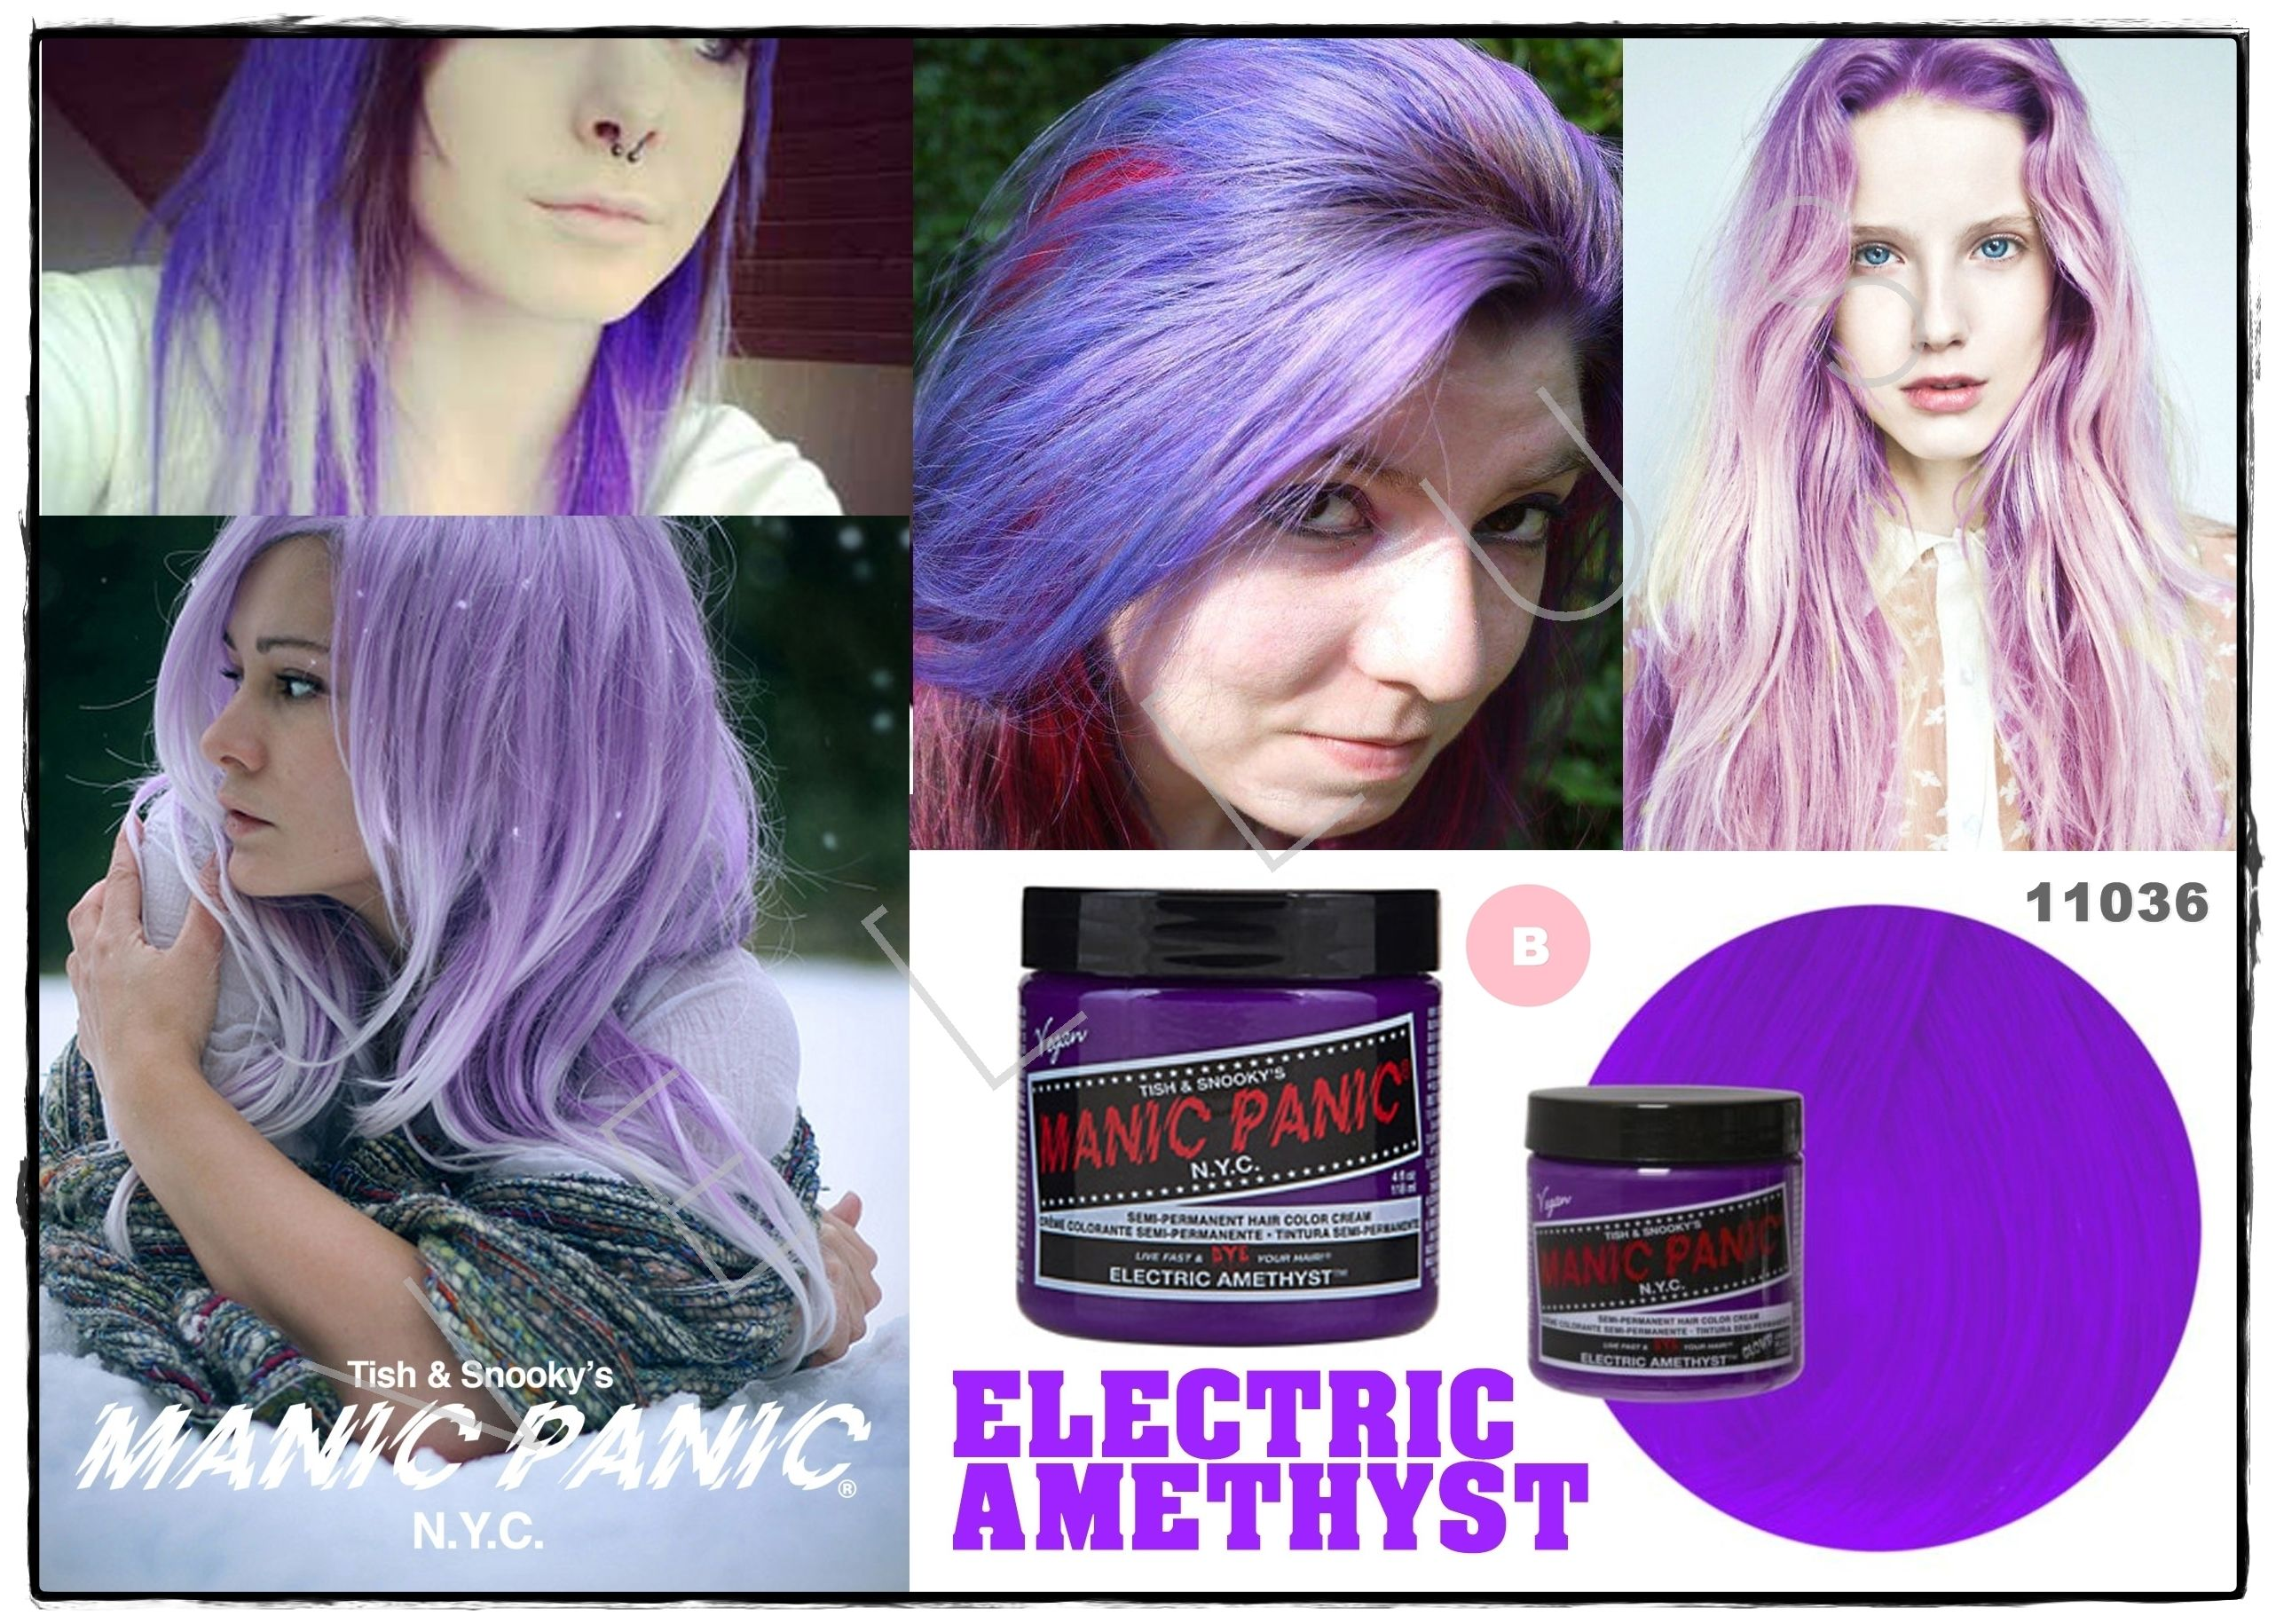 Manic Panic Classic Electric Amethyst Vellus Hair Studio 83a Tanjong Pagar Road S 088504 Tel 62246566 Hair Color Cream Hair Studio Manic Panic Hair Dye